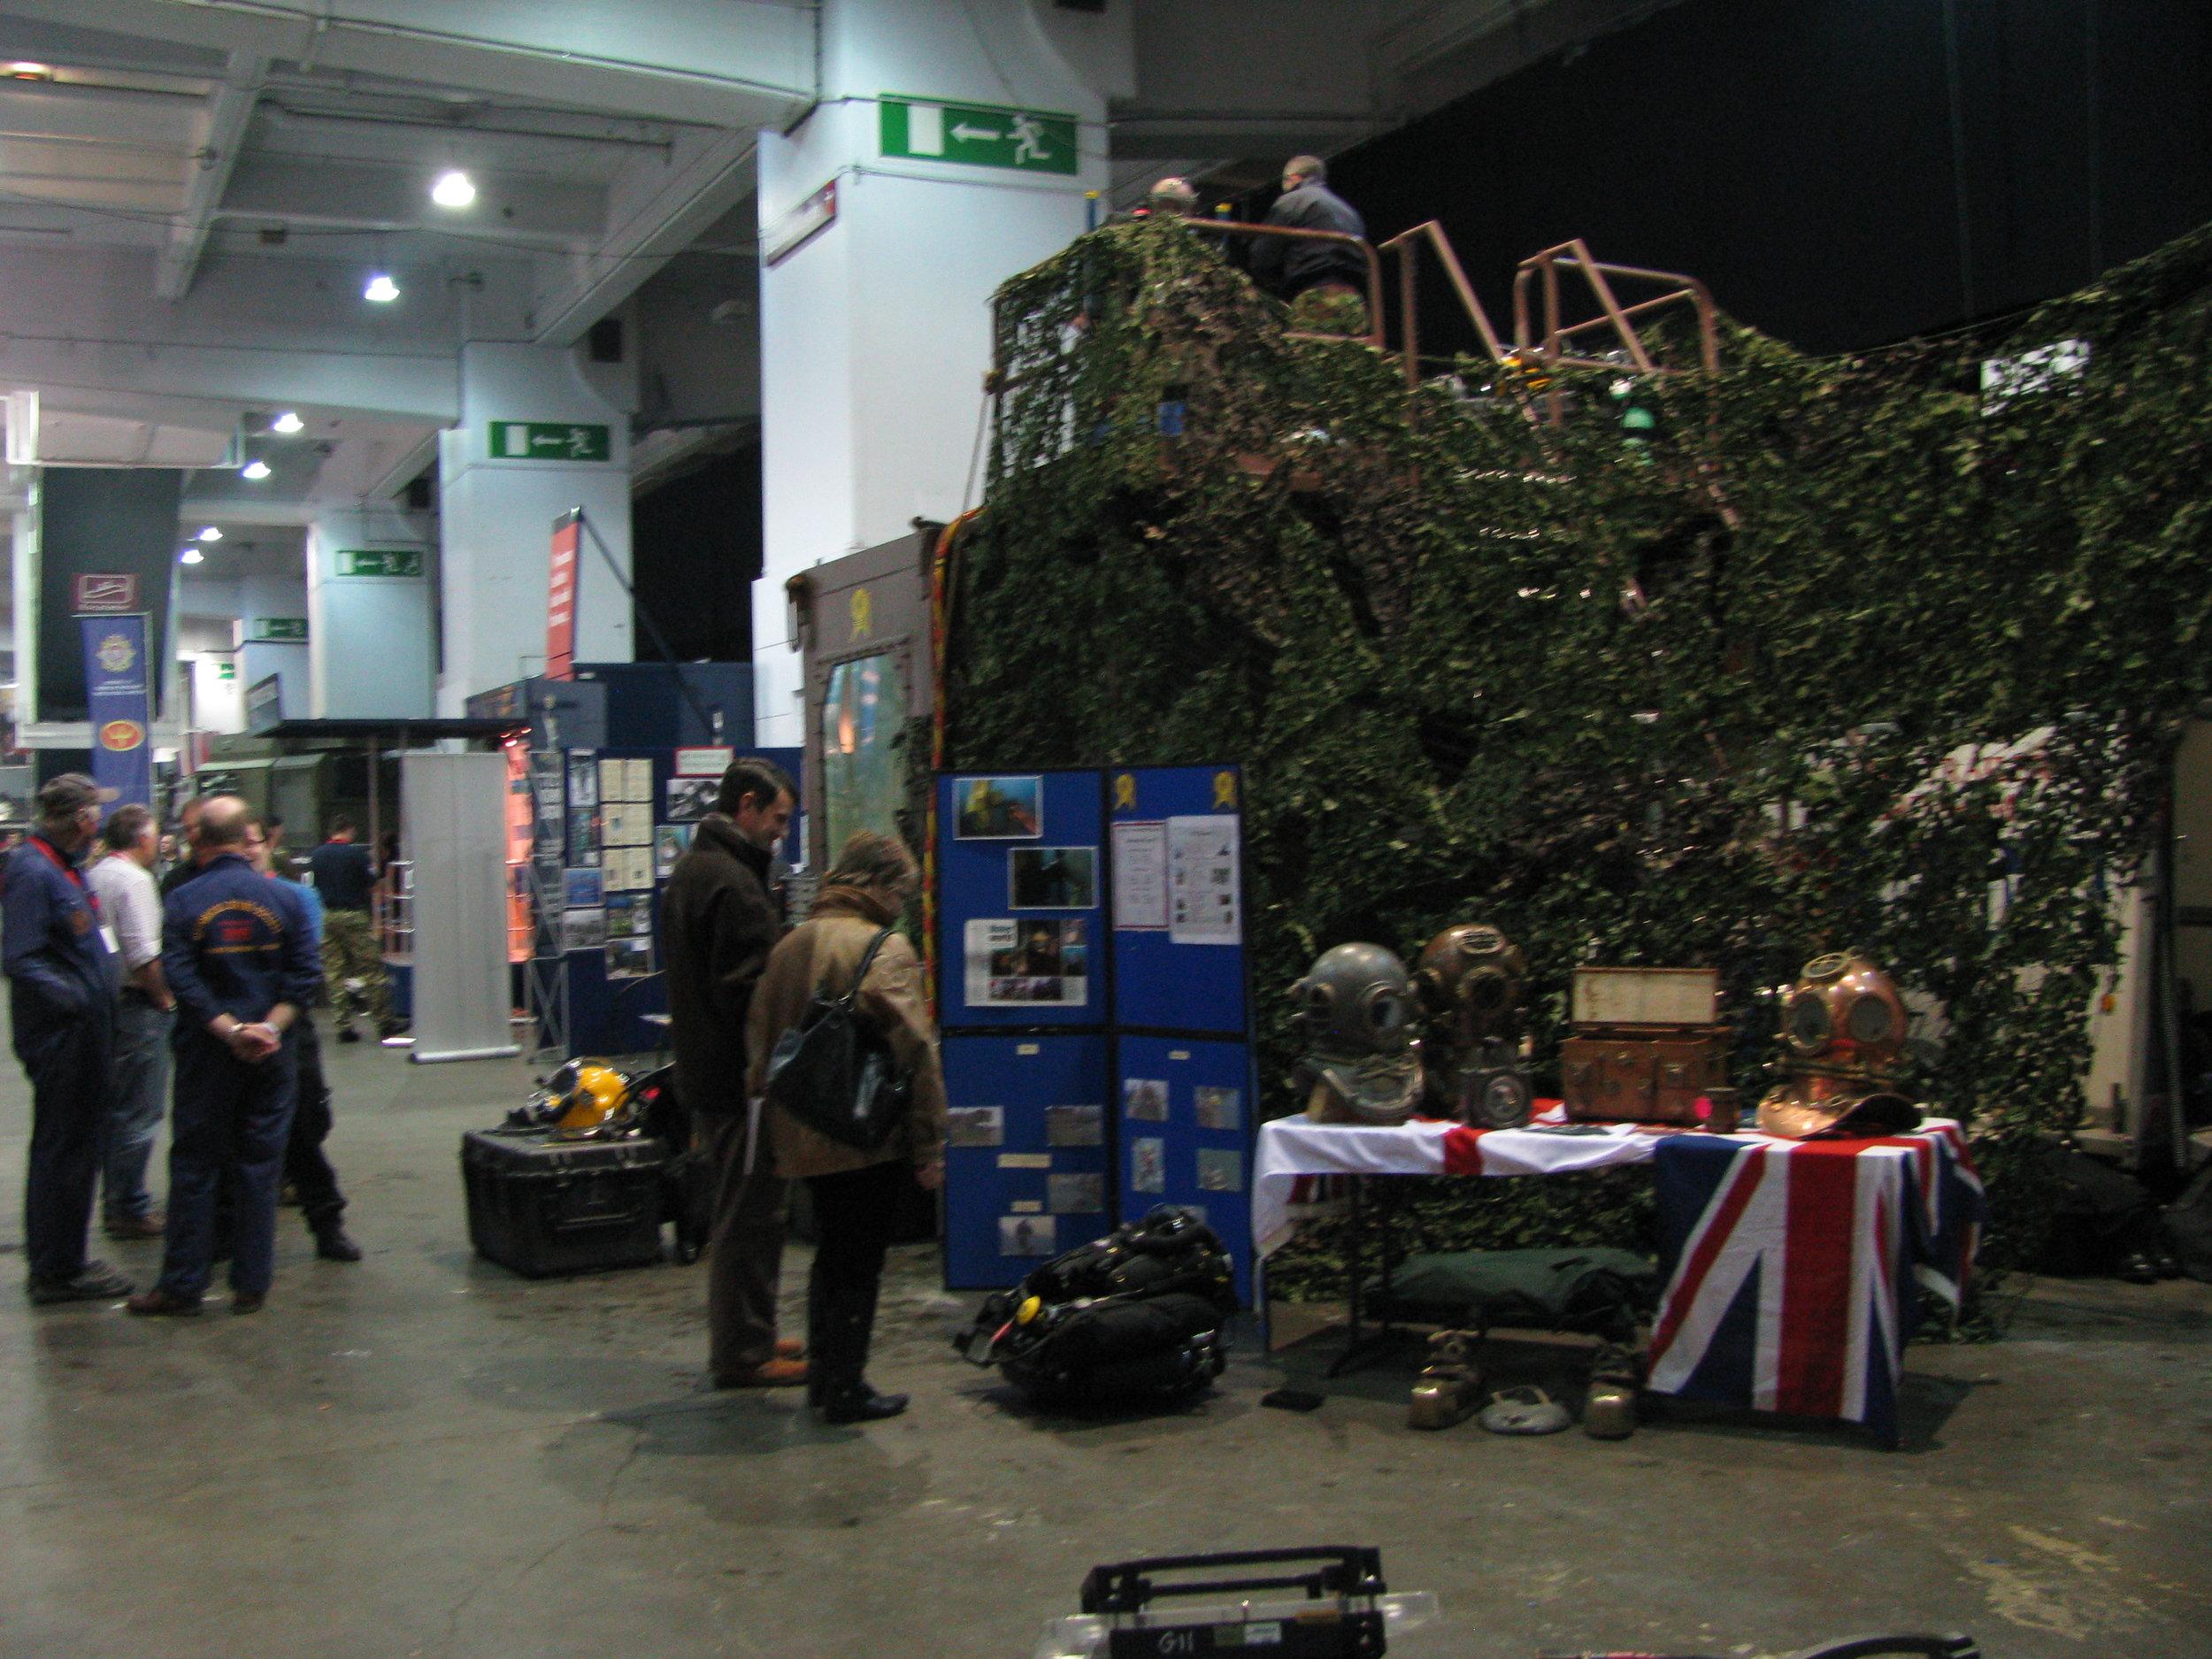 British Military Tournament 2 Dec 2011 053.jpg